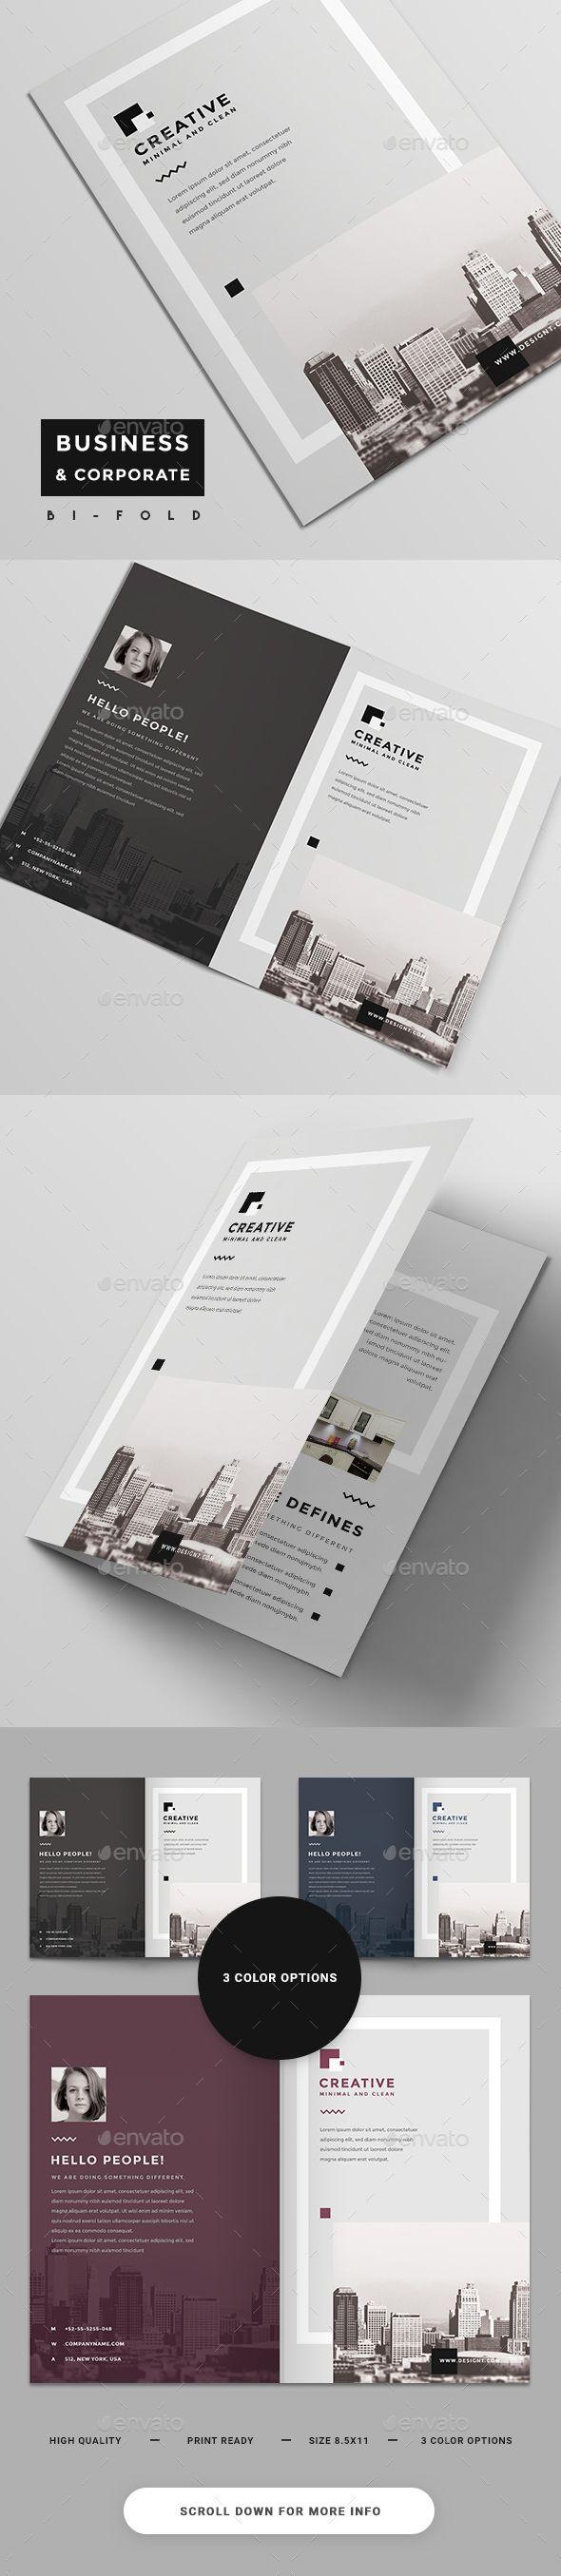 Corporate Bi-Fold Brochure - #Brochures Print #Templates Download here: https://graphicriver.net/item/corporate-bifold-brochure/19388742?ref=alena994